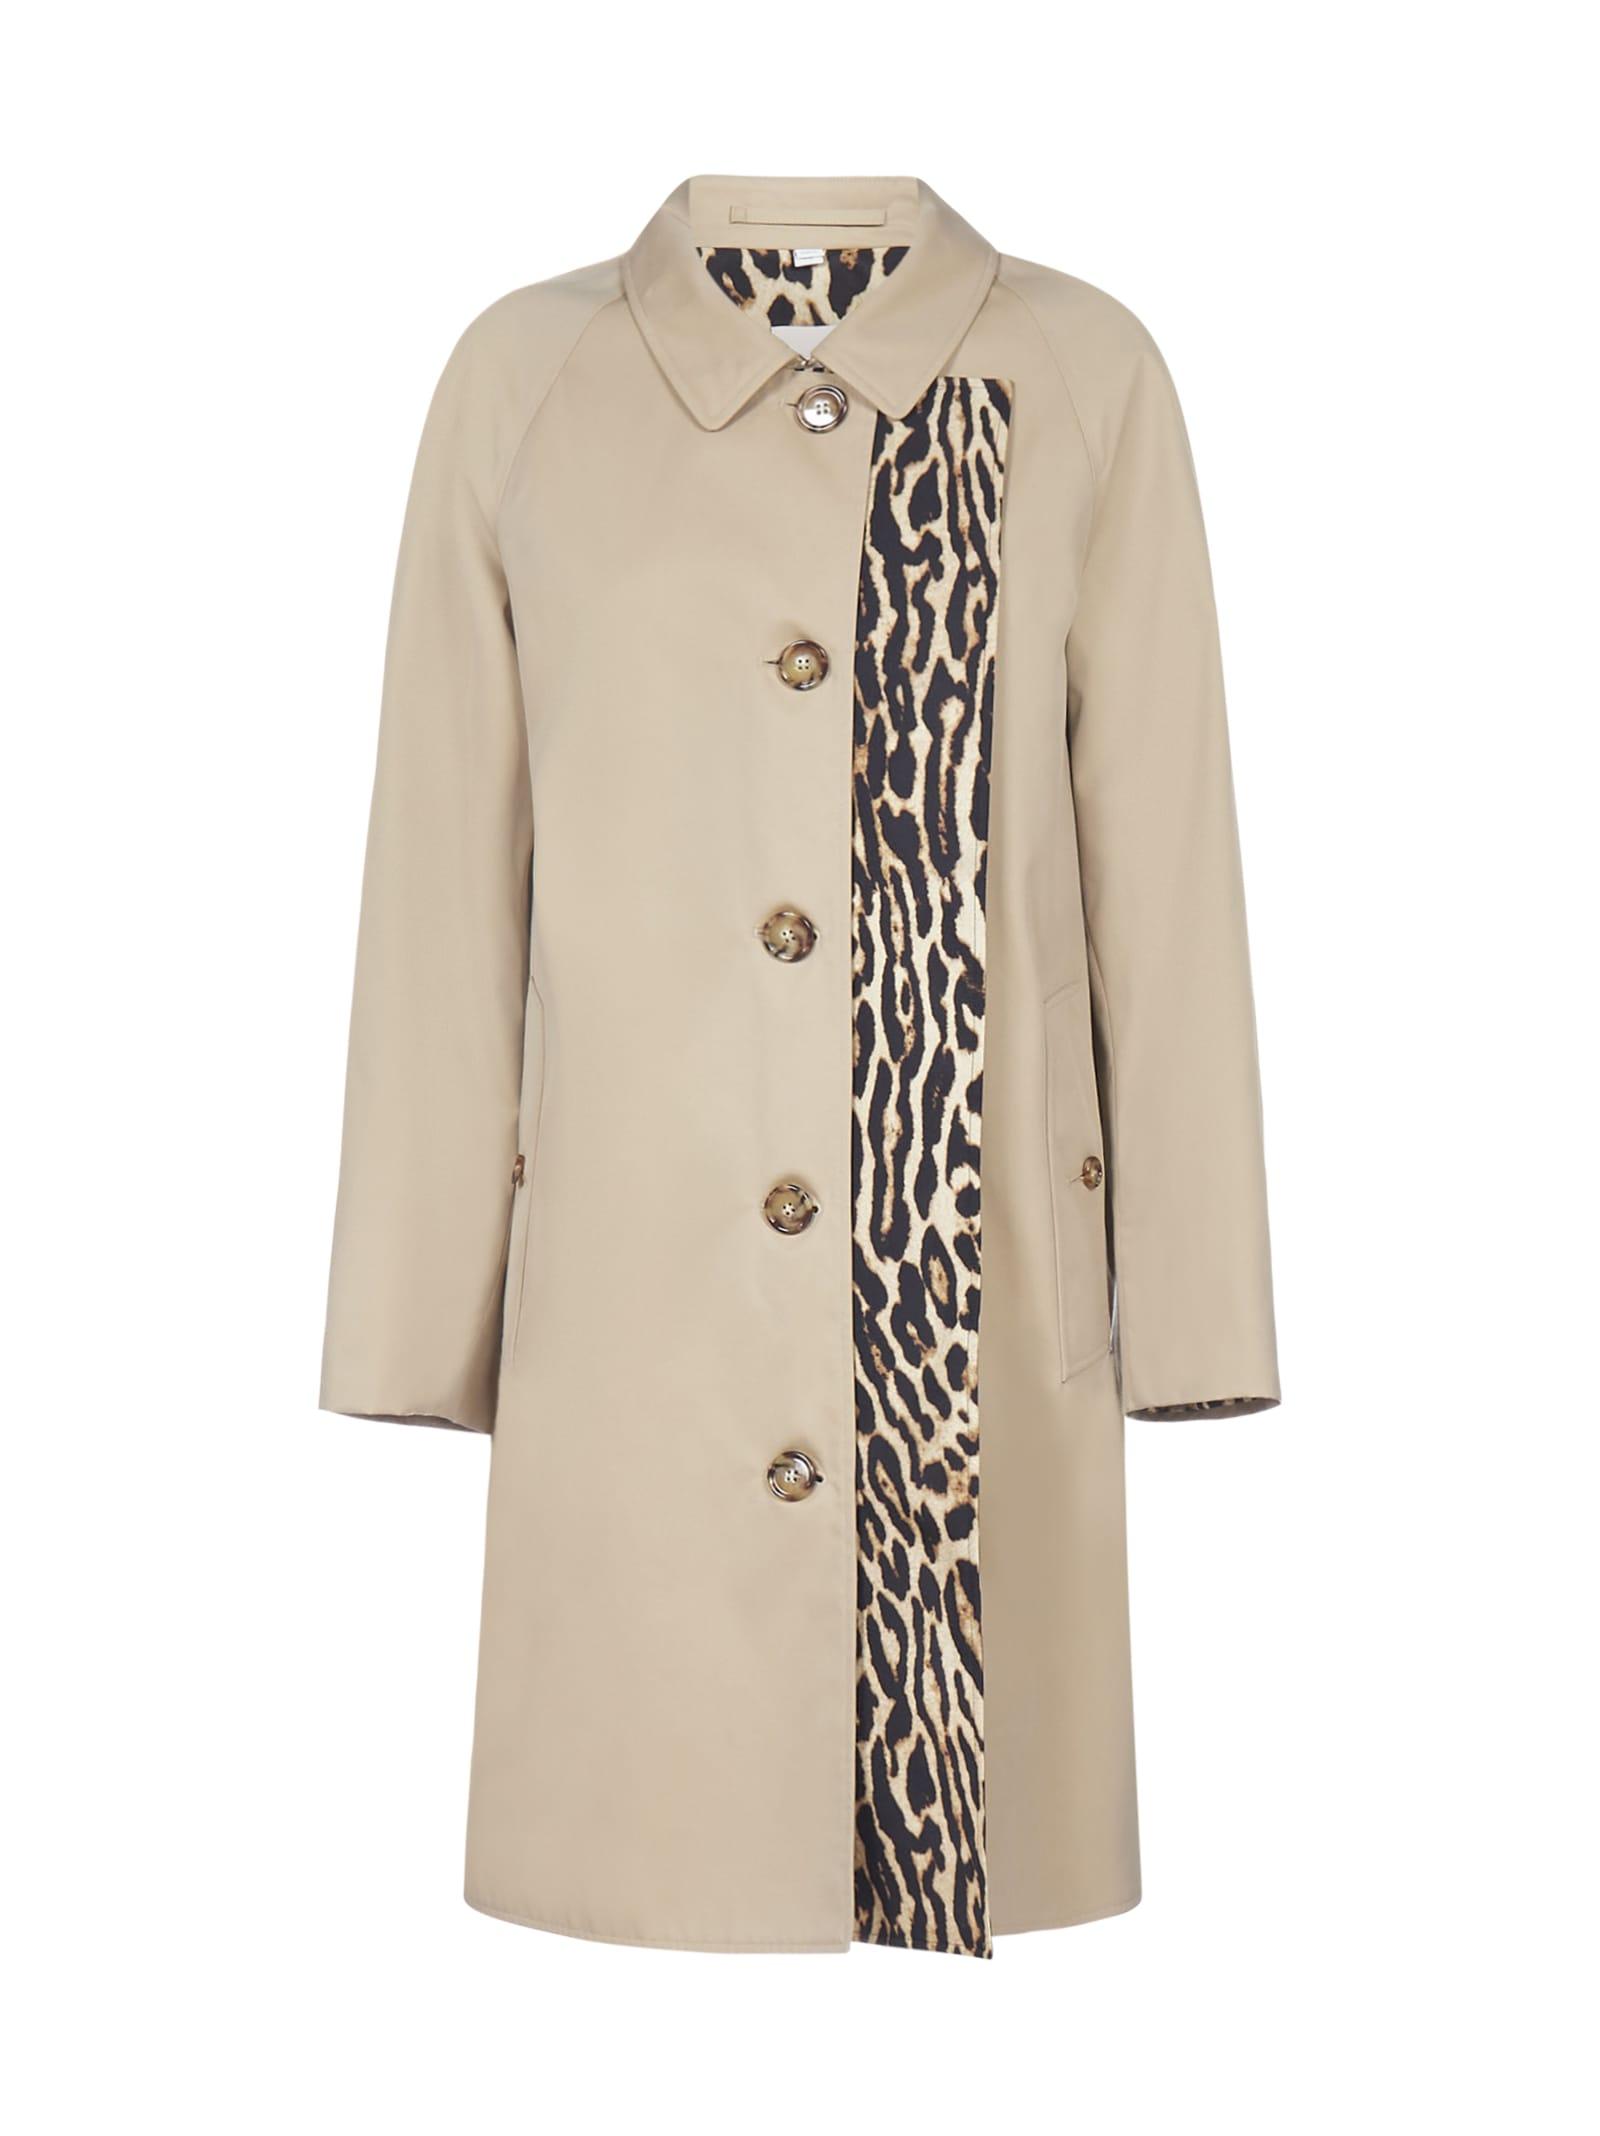 Burberry Walter Stone Raincoat